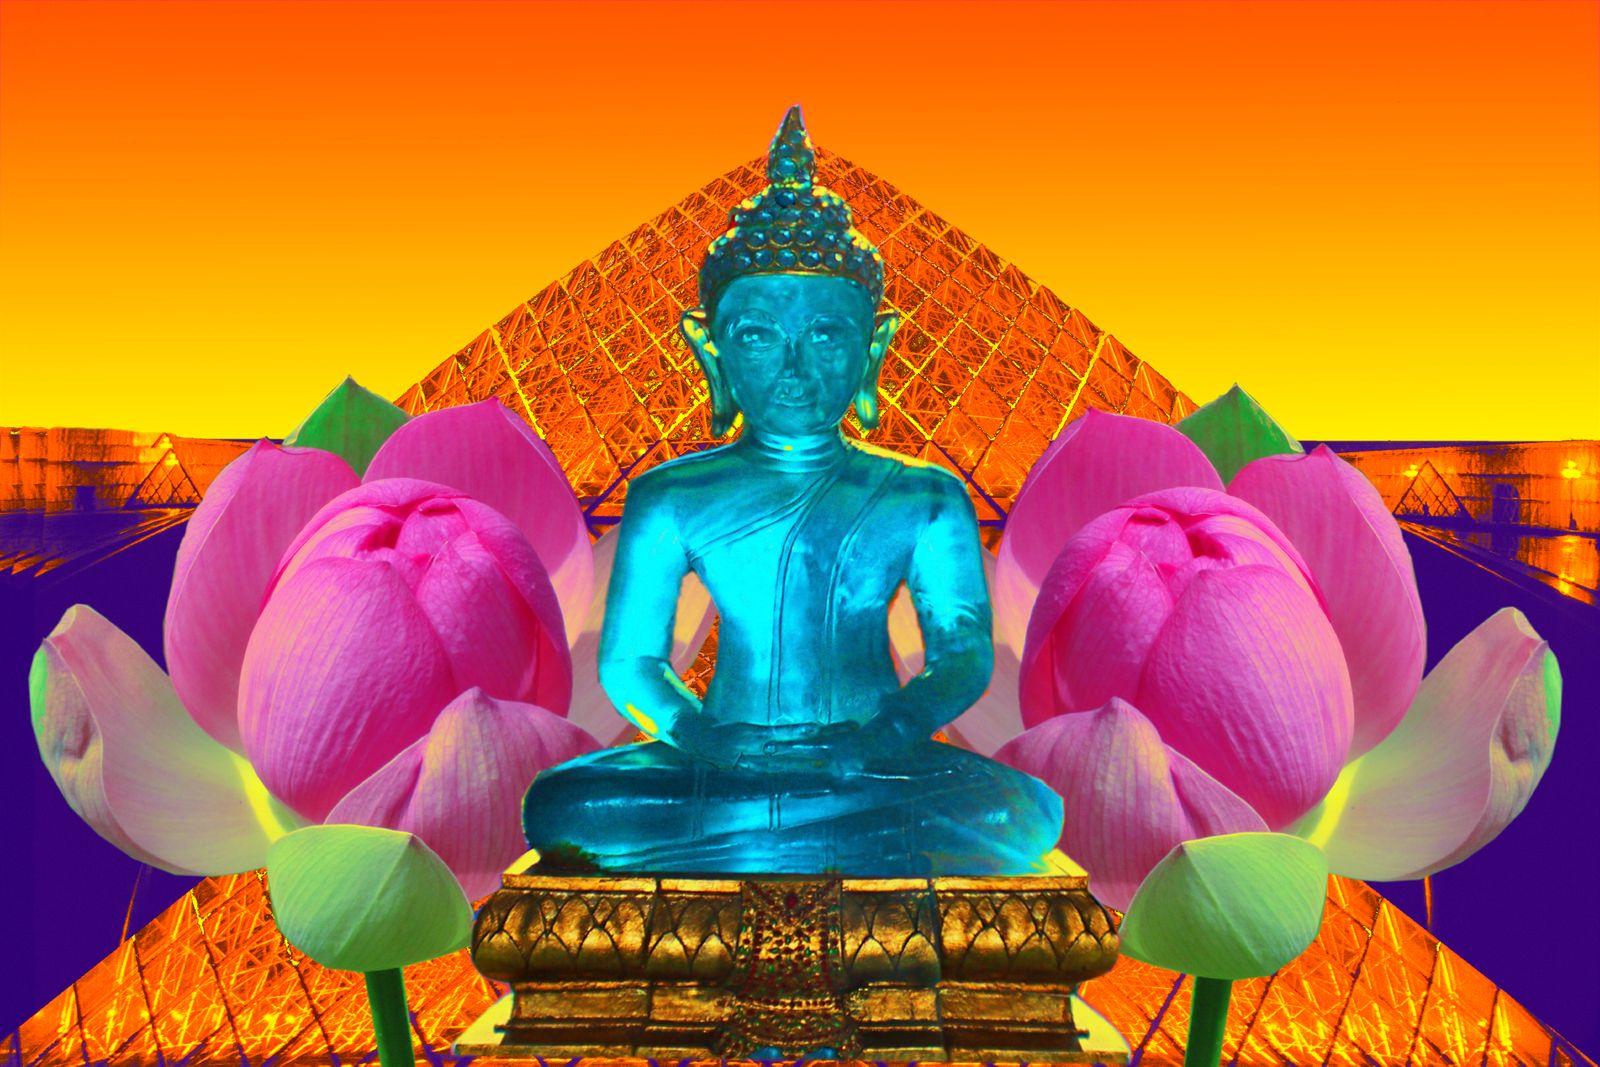 Gottlieb-Paris Buddha